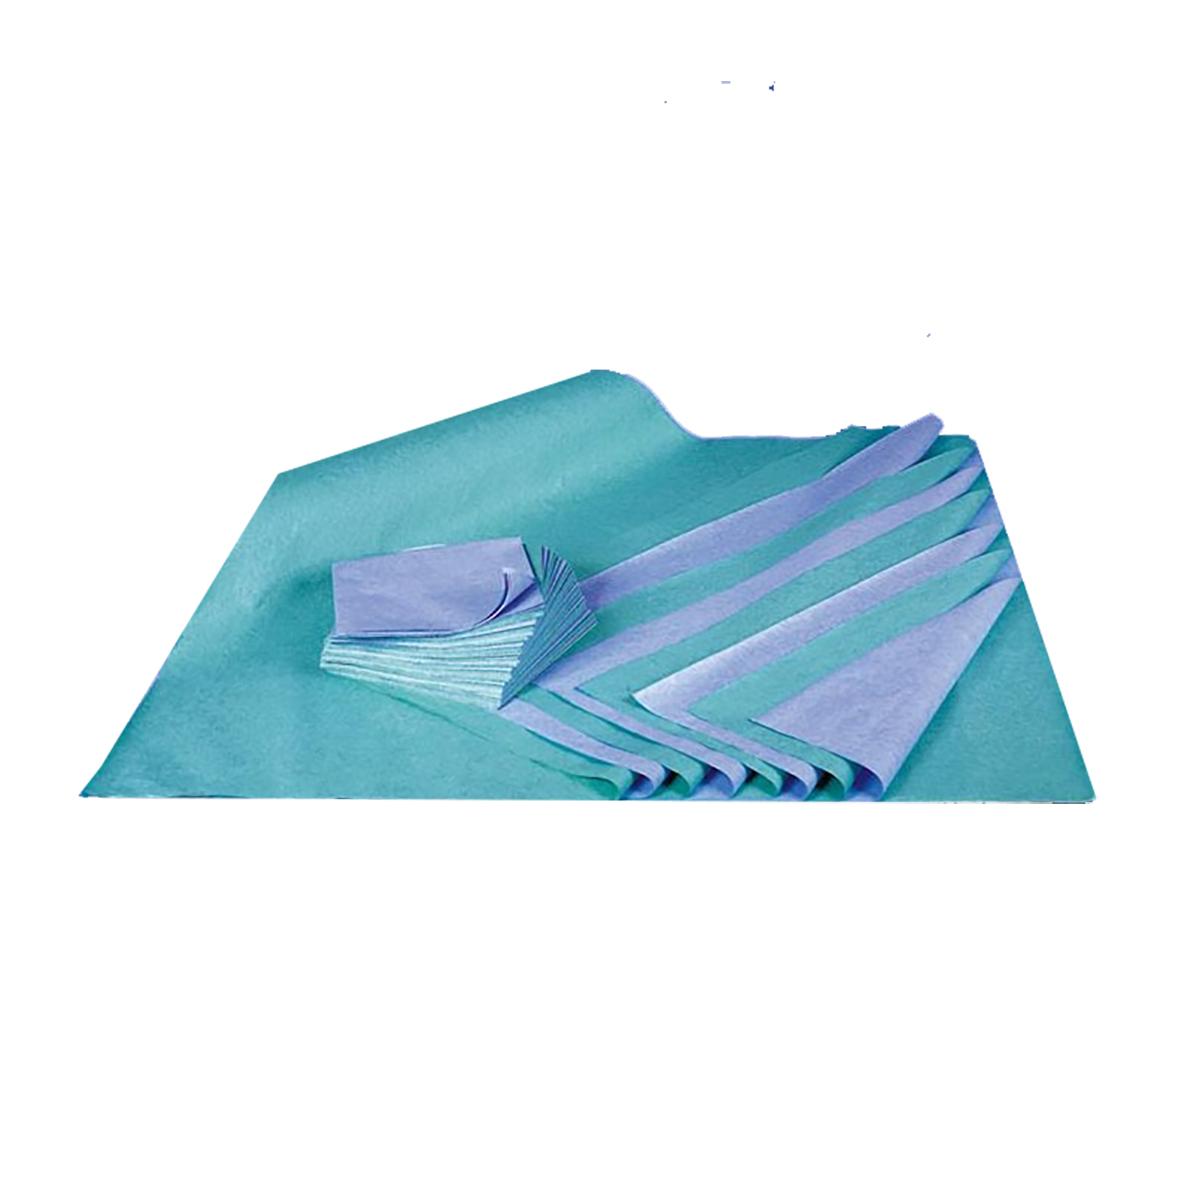 Reliance Blue 345 Image